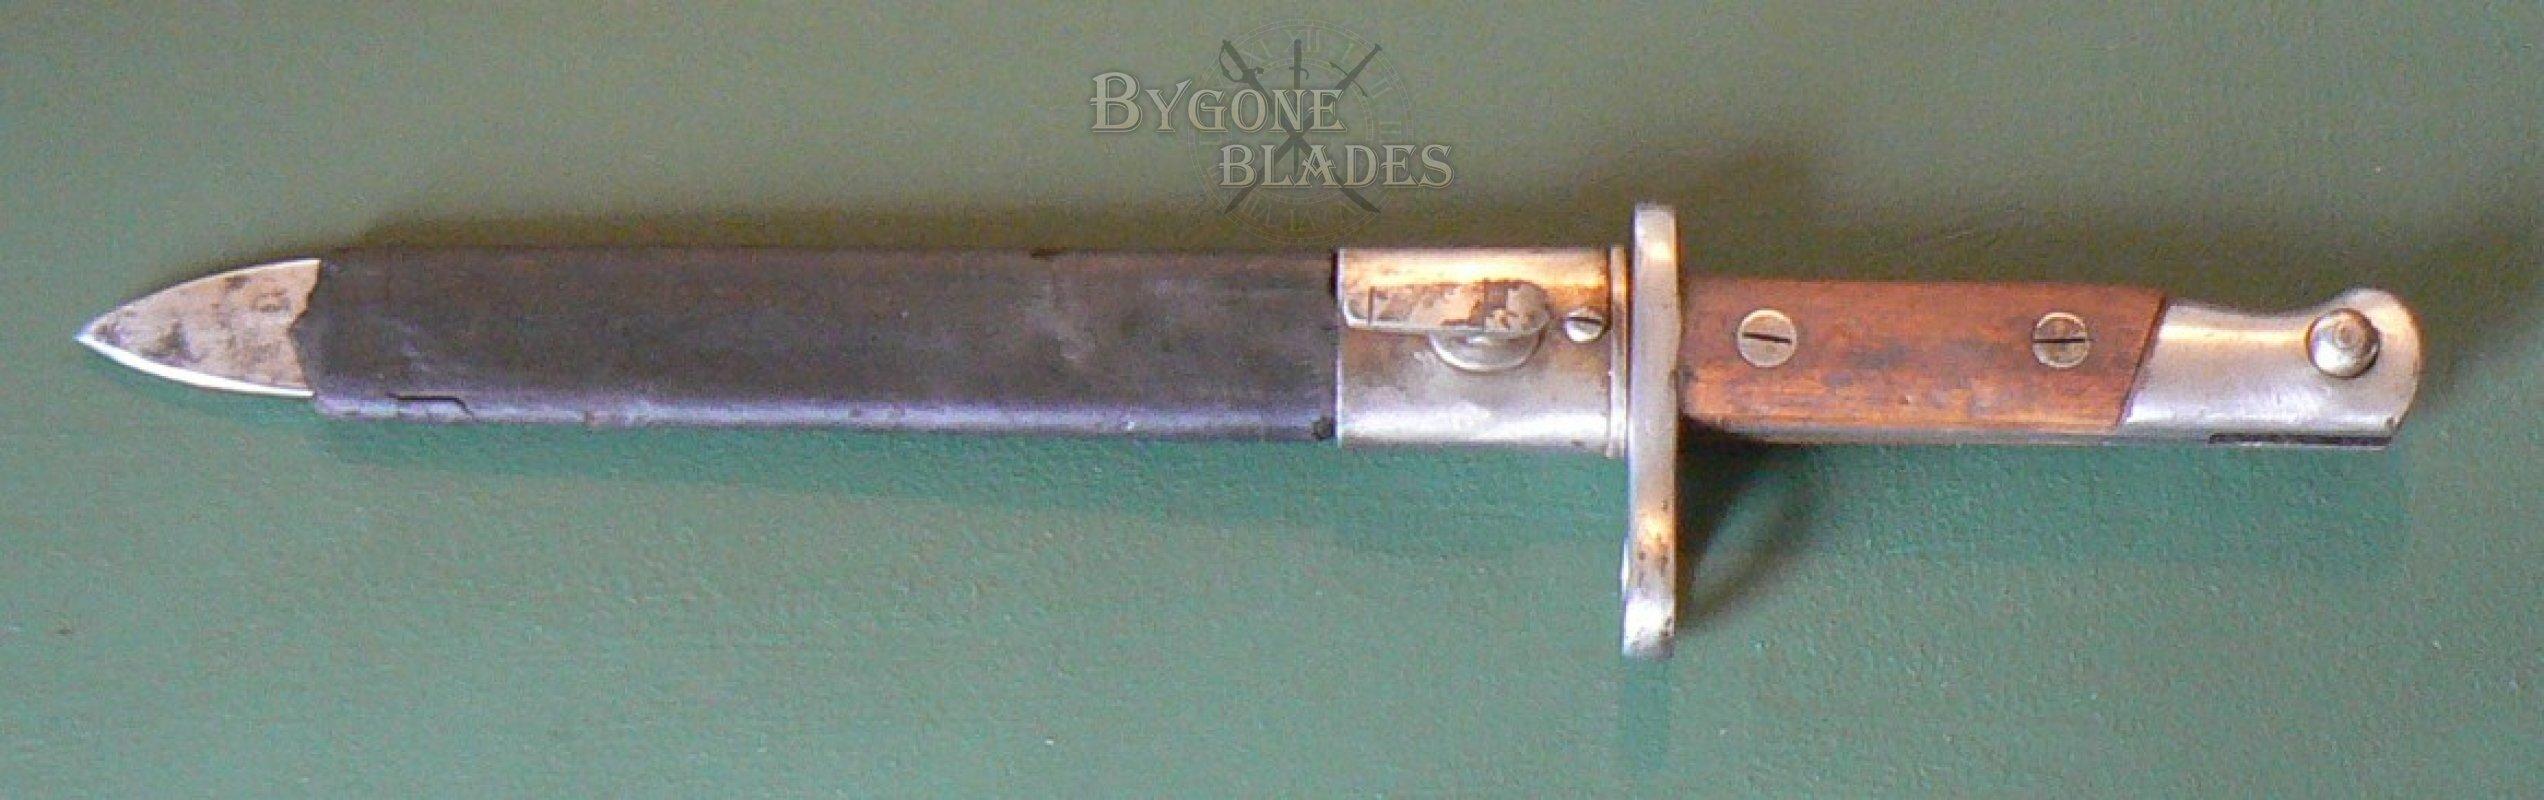 Spanish M1893 Mauser Bayonet | Bygone Blades